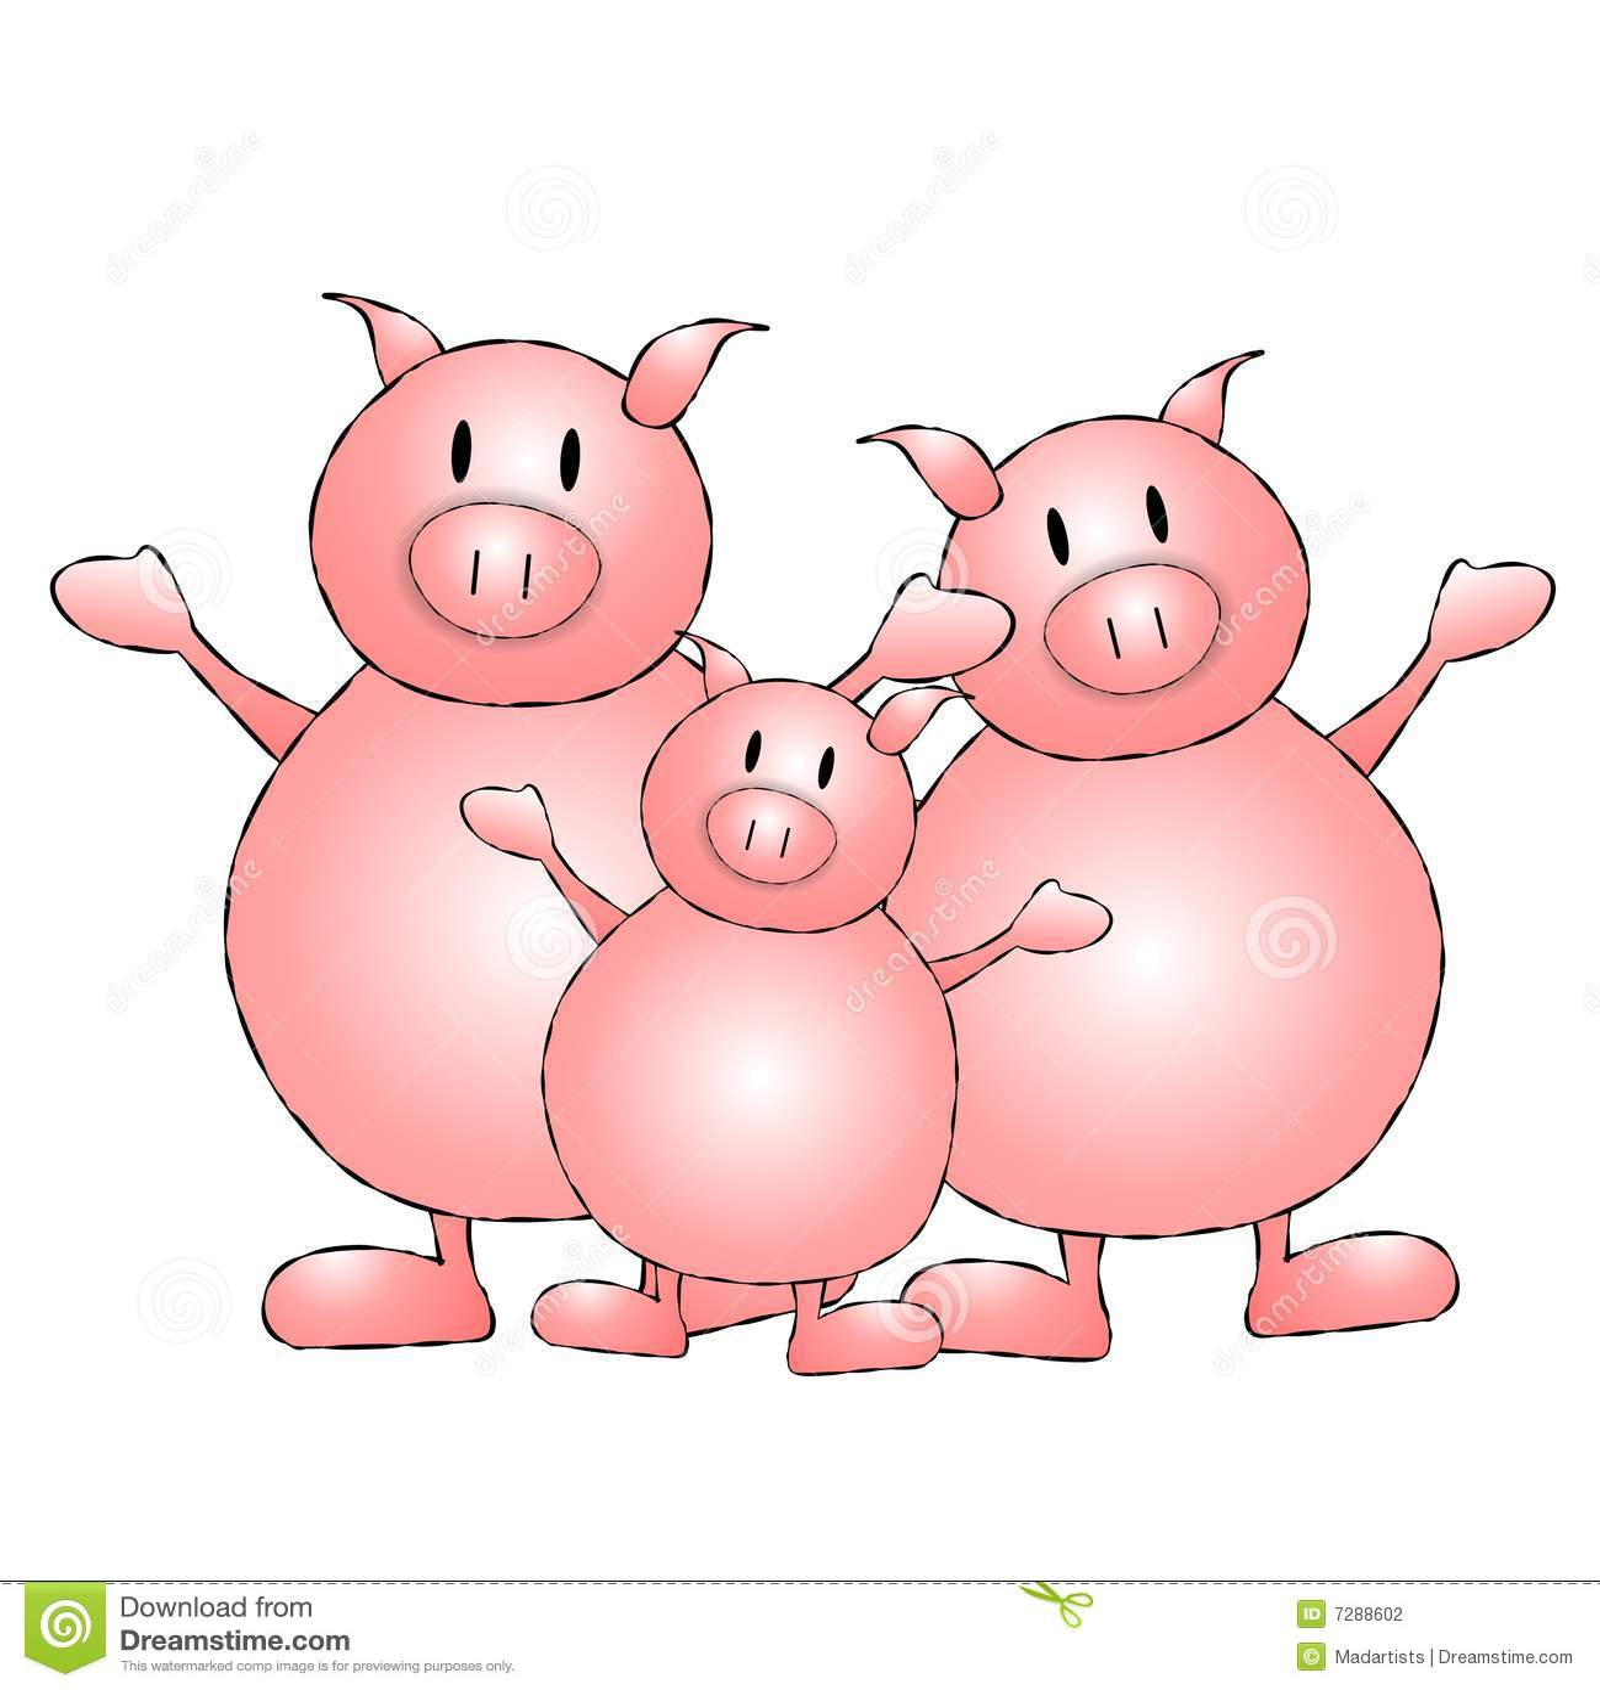 Three Little Pigs Cartoon Stock Photography - Image: 7288602